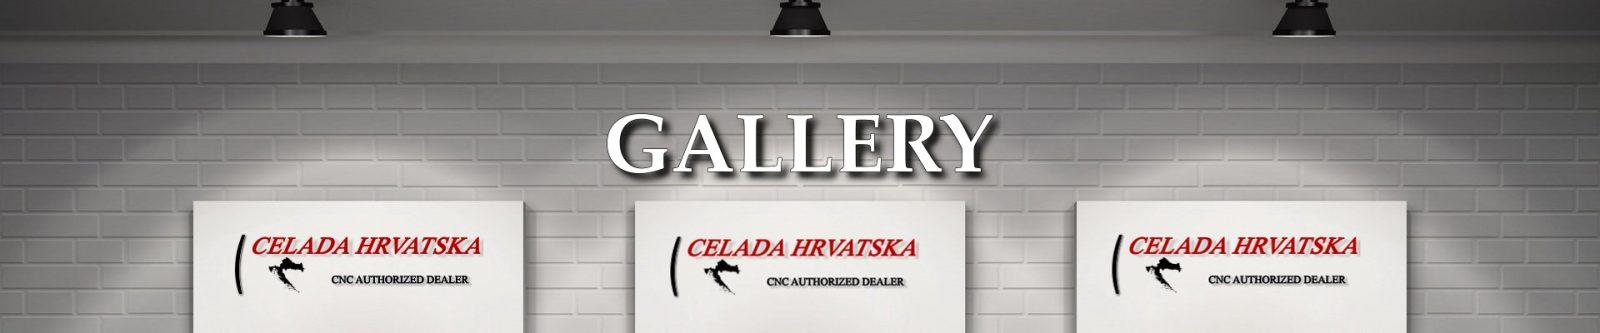 CELADA-CROATIA-GALLERY